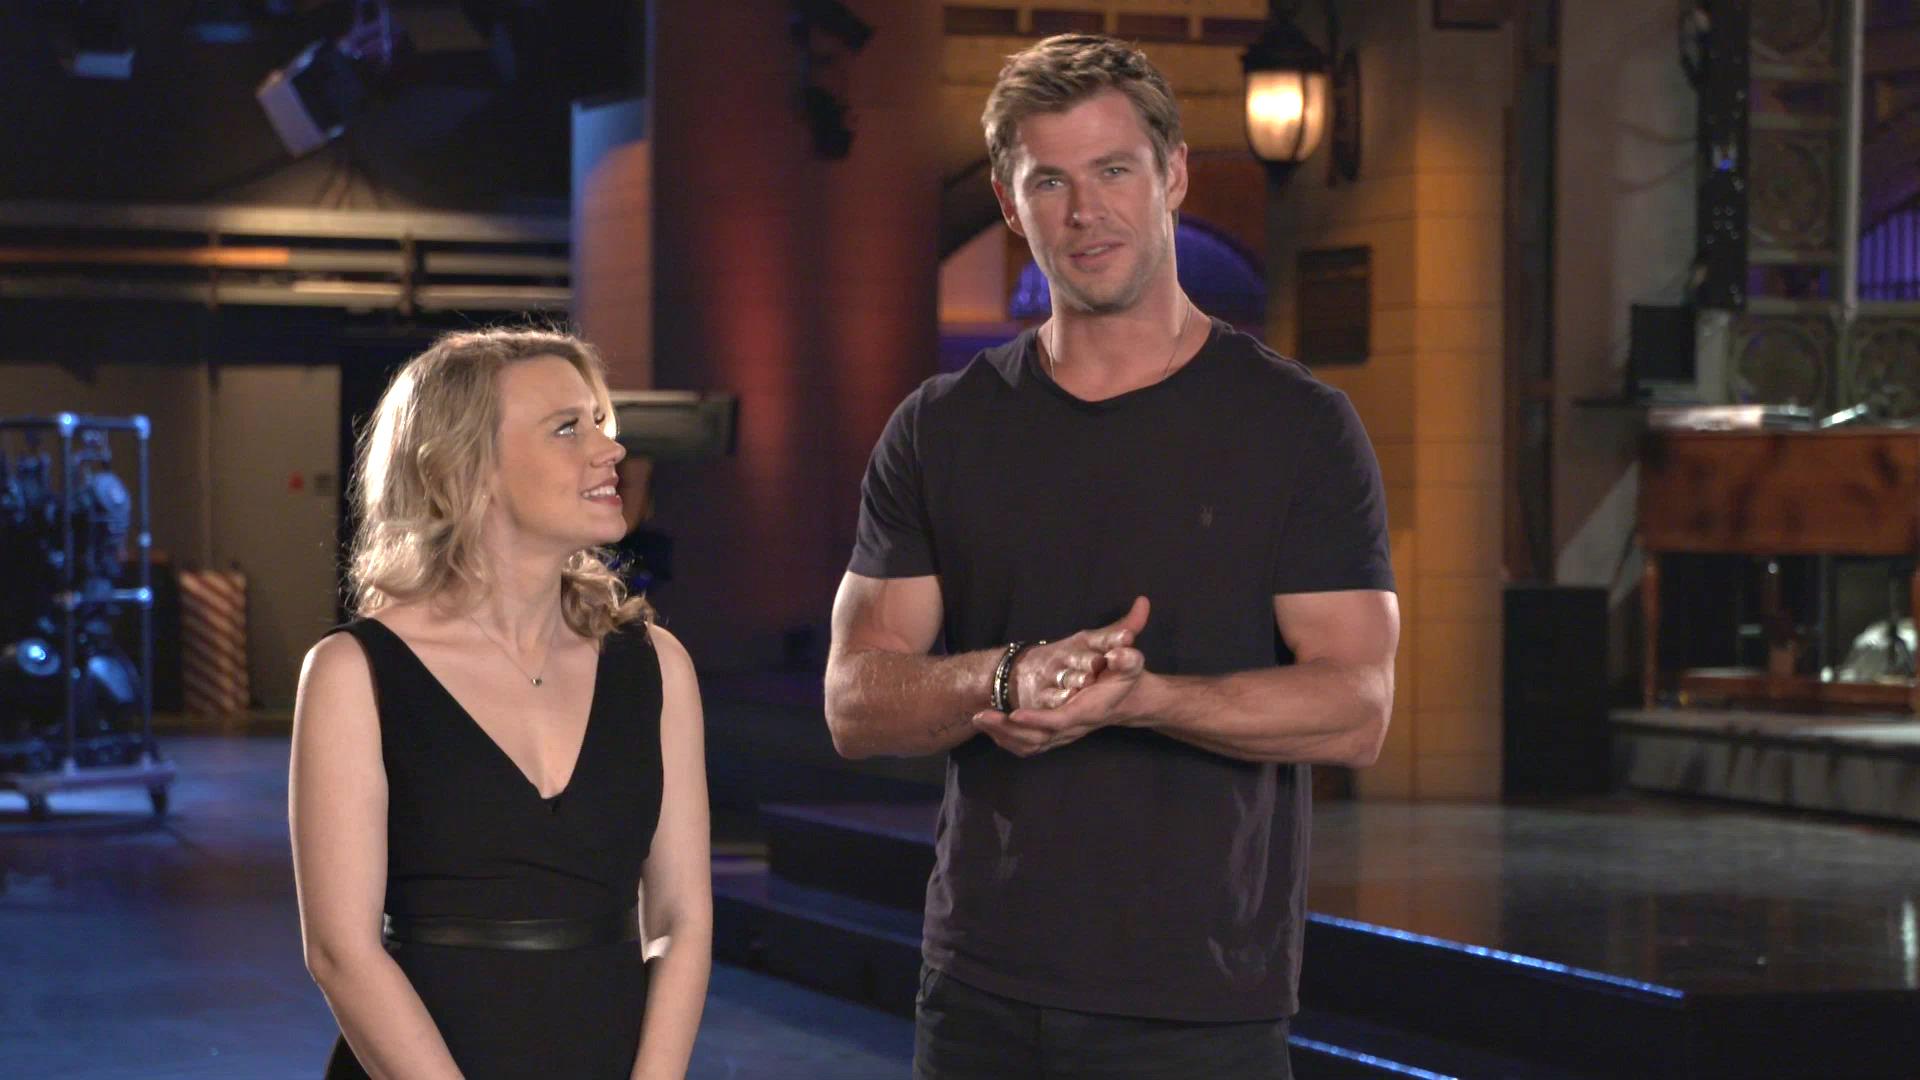 Watch Kate McKinnon and SNL Host Chris Hemsworth Attempt a ...